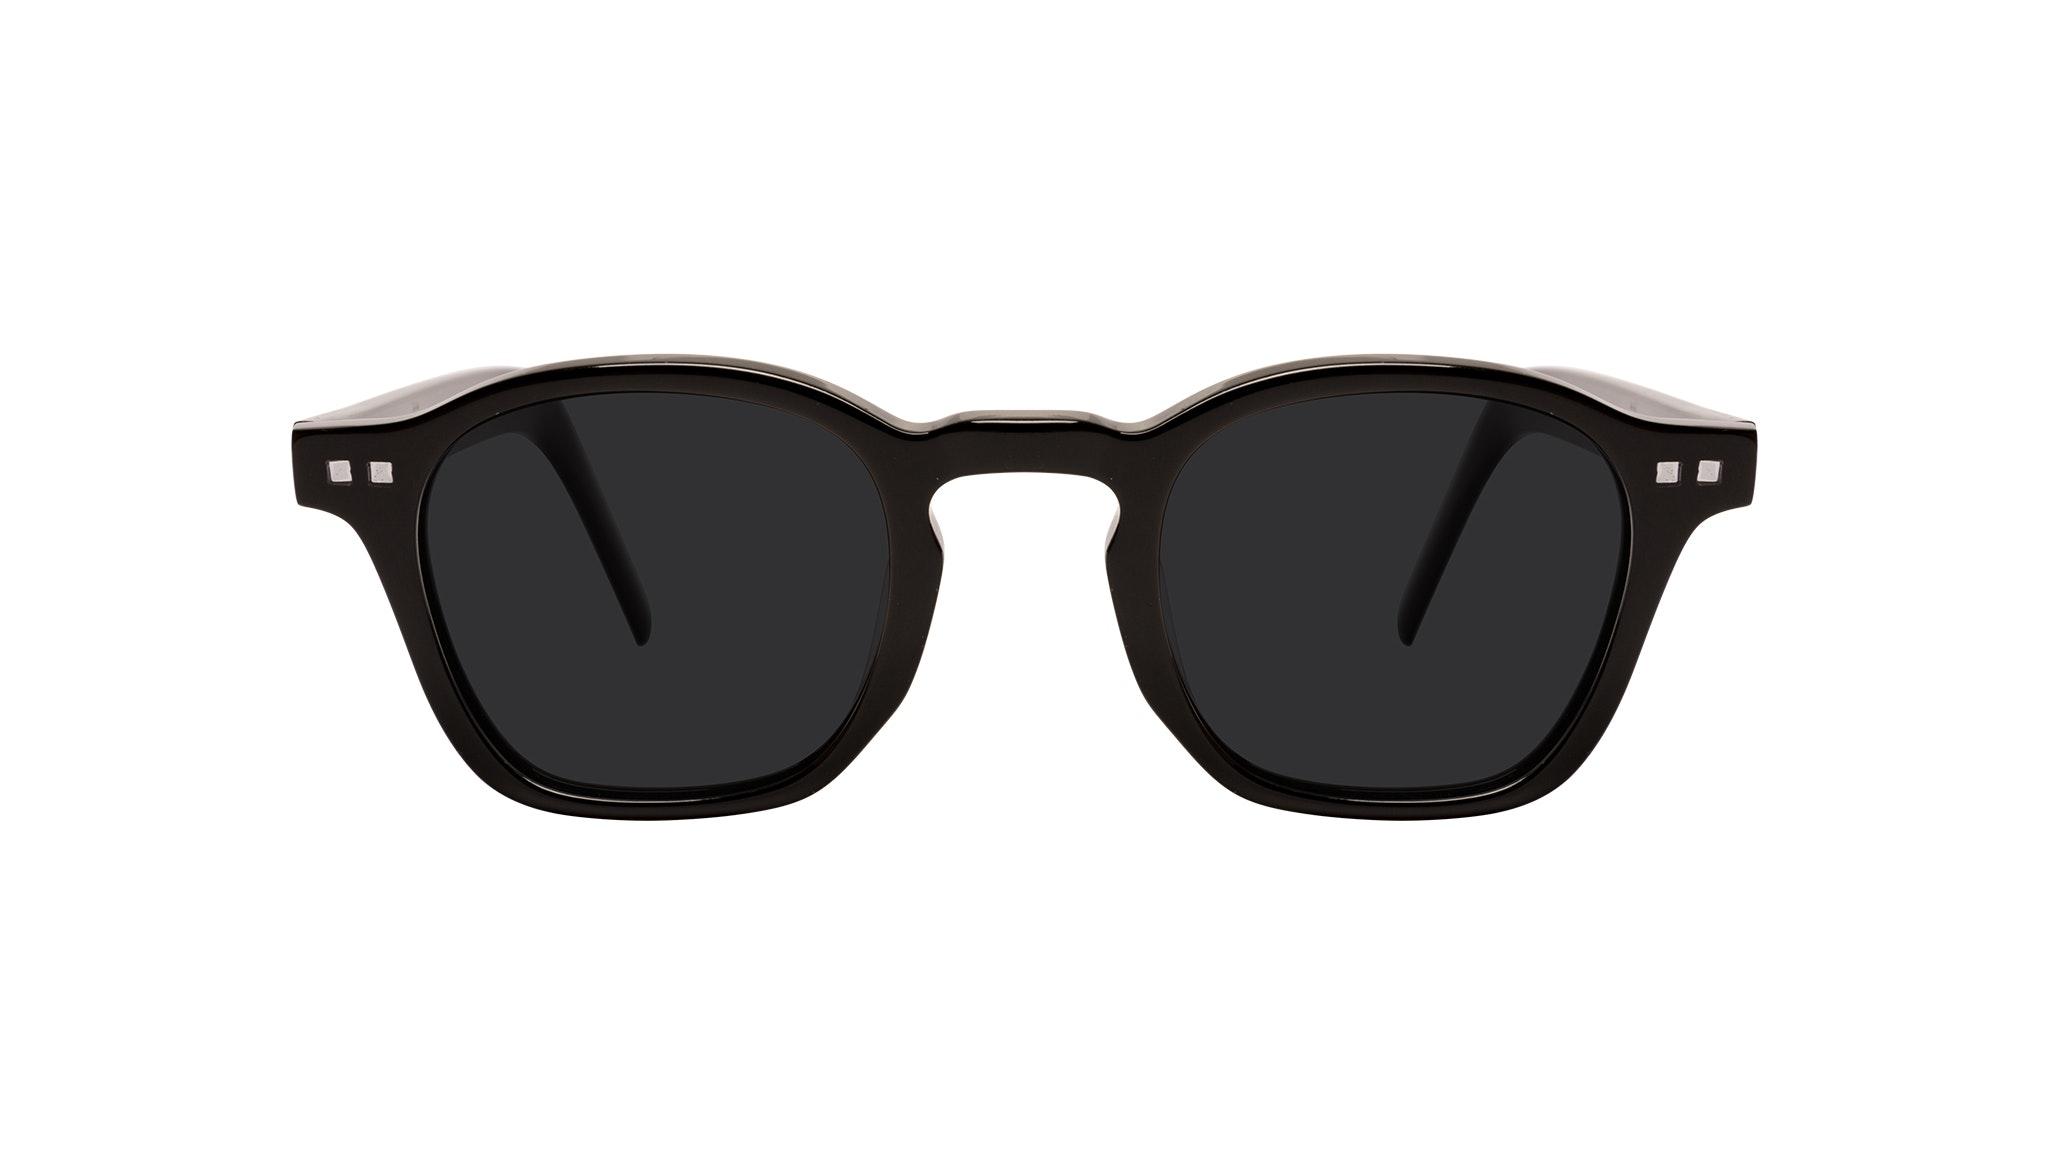 Affordable Fashion Glasses Square Sunglasses Men Brisk Onyx Front